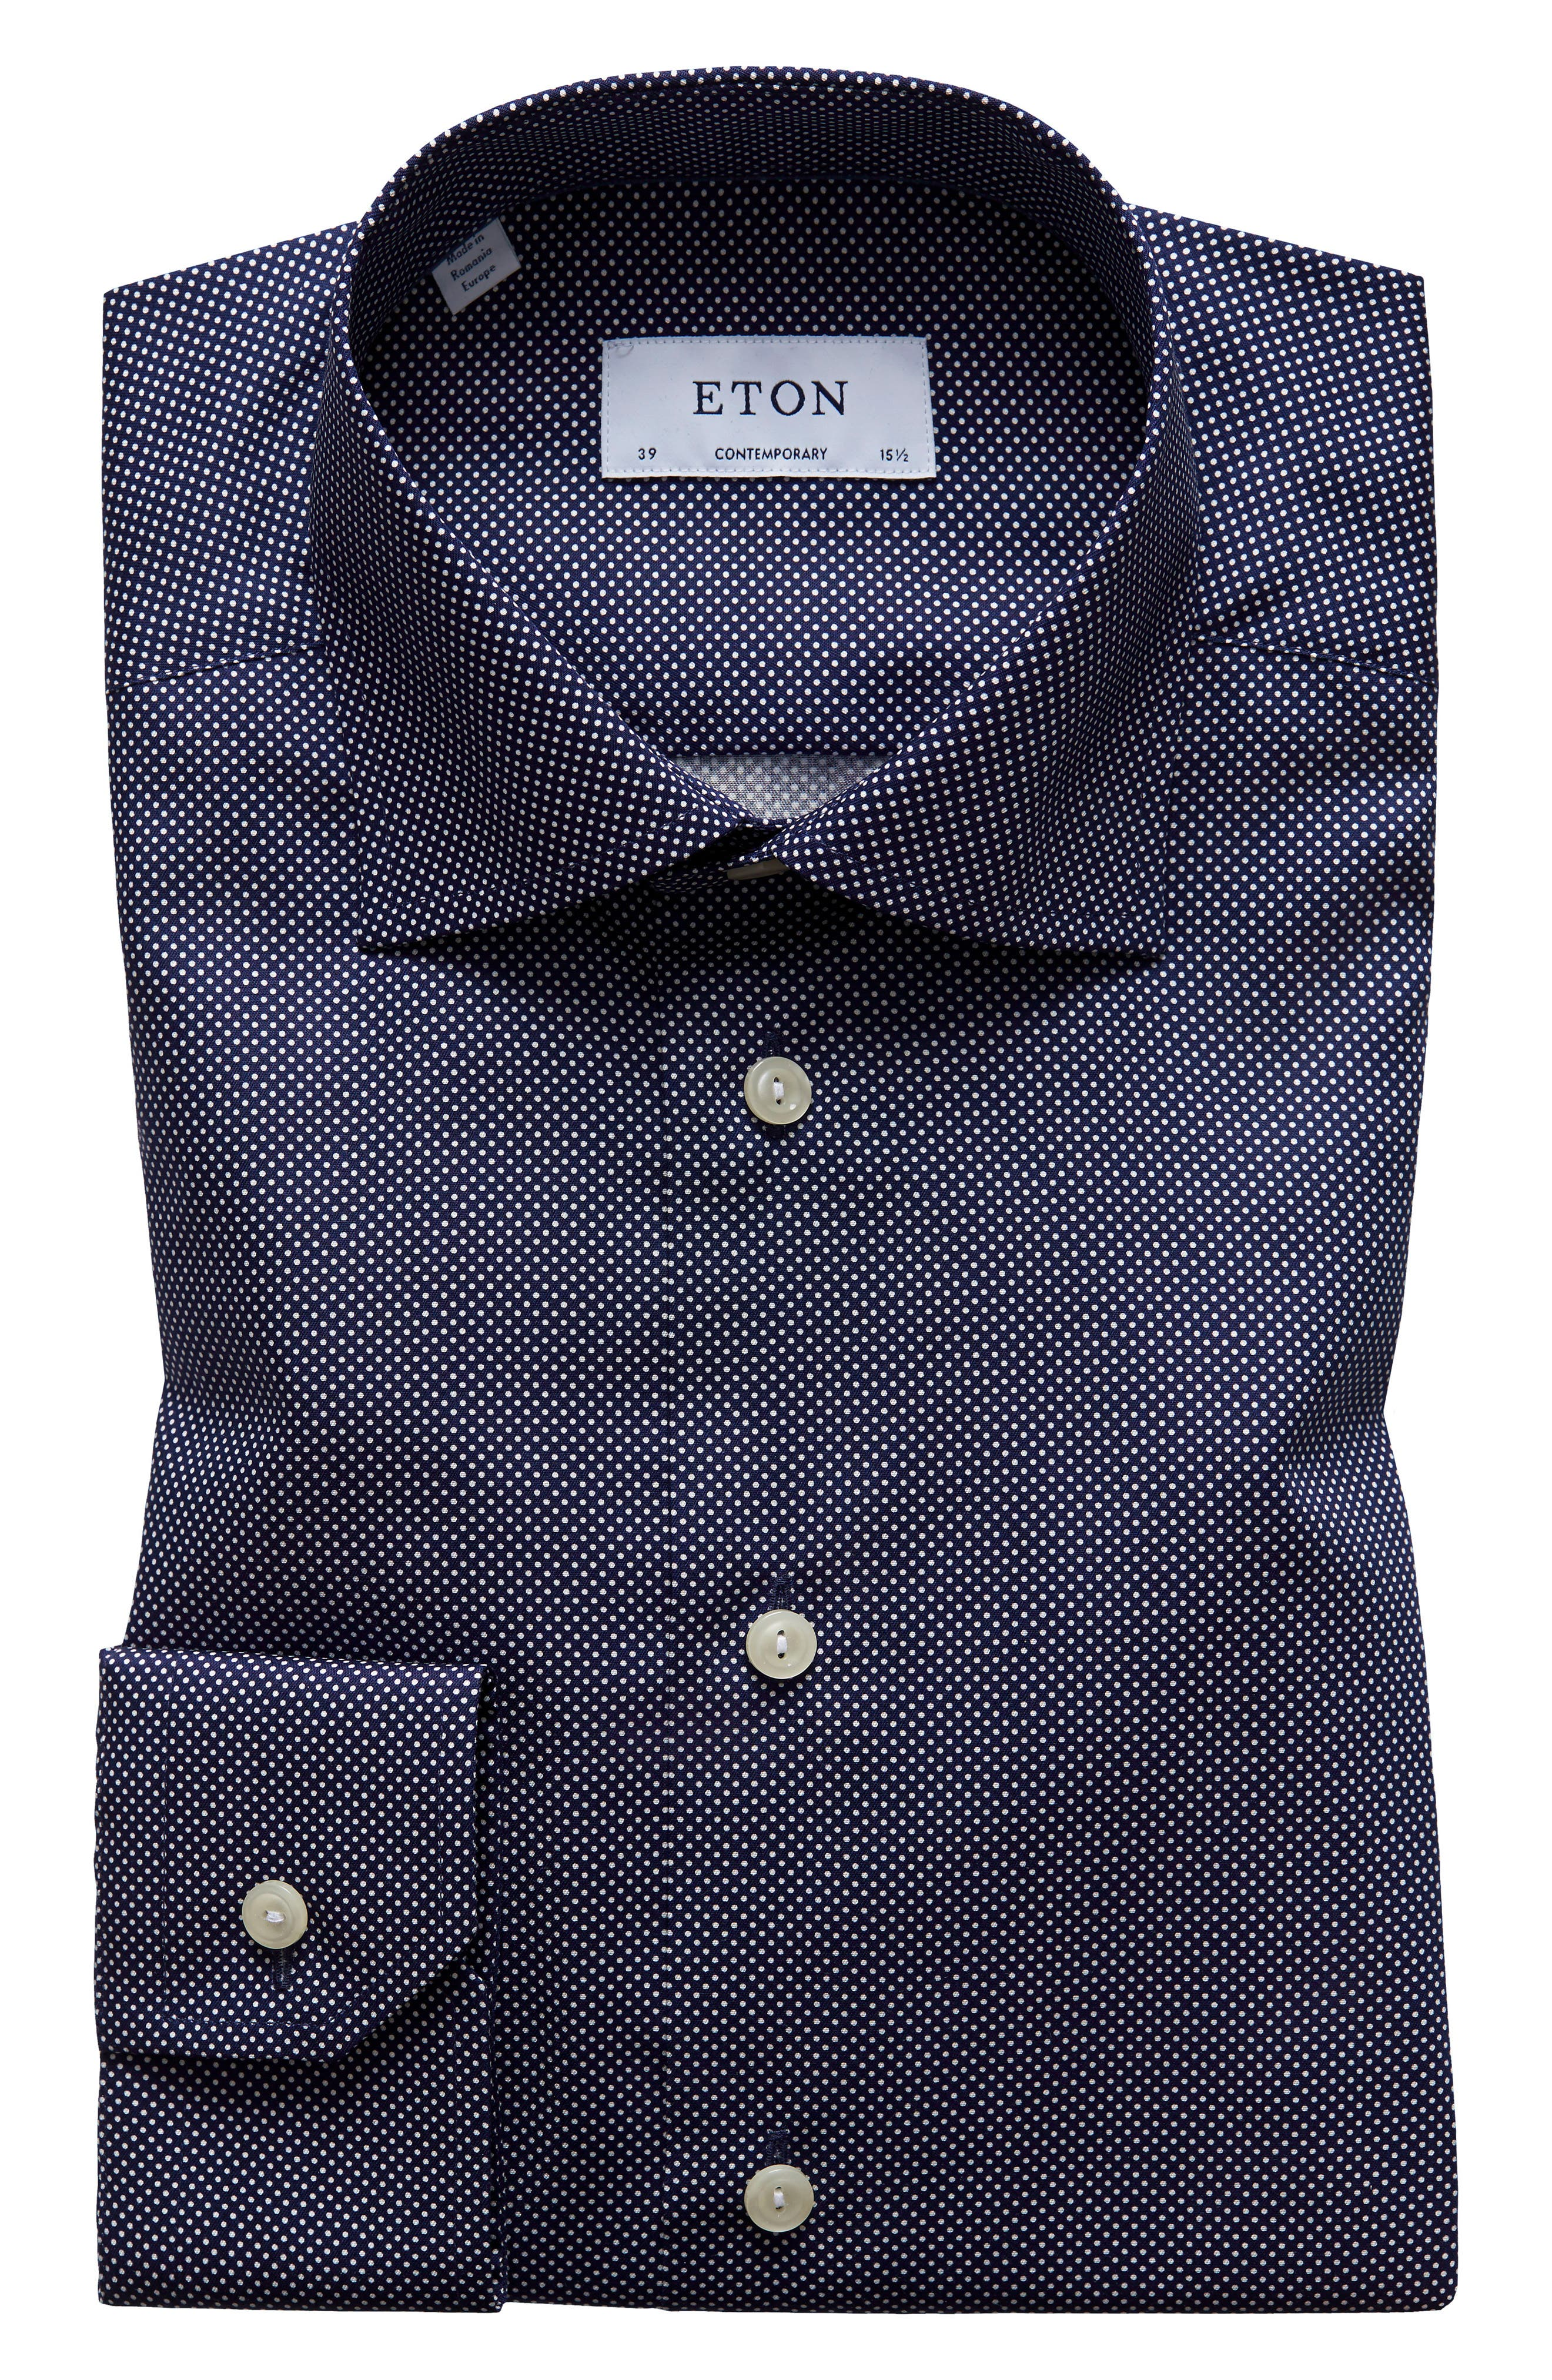 Contemporary Fit Signature Polka Dot Dress Shirt,                         Main,                         color, Blue